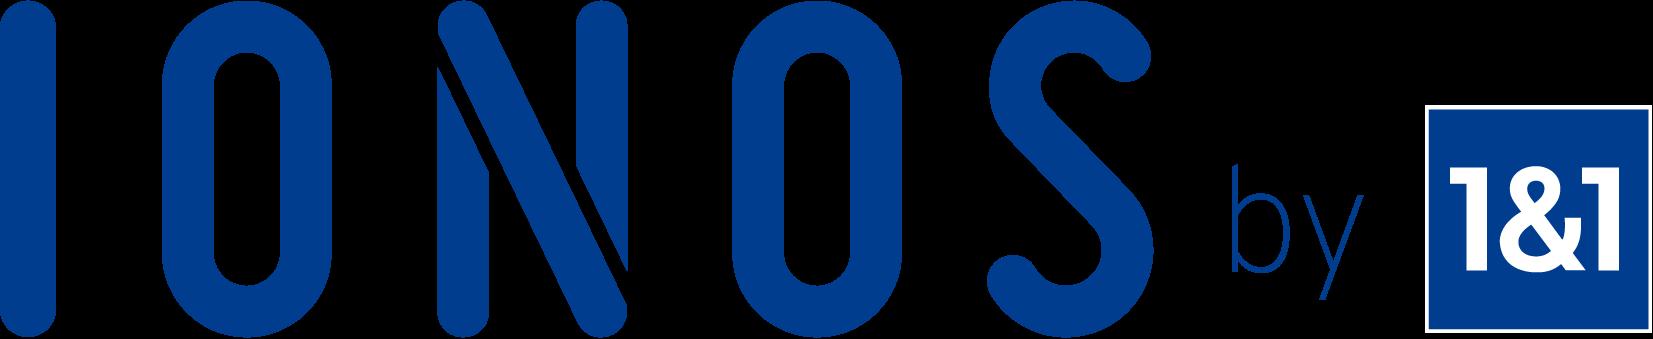 IONOS by 1&1 Logo